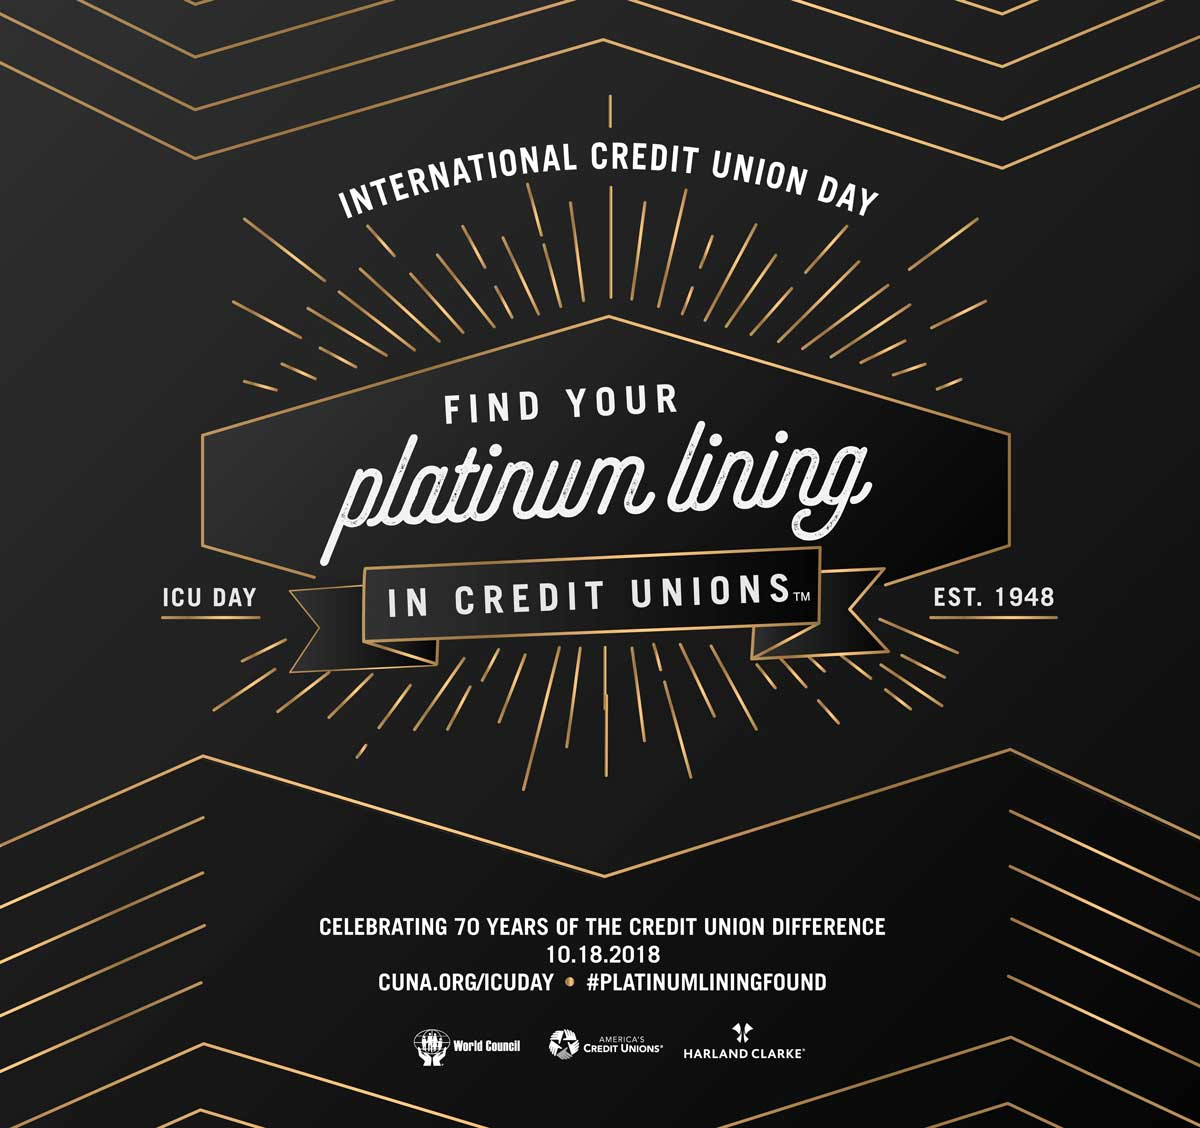 International Credit Union Day poster